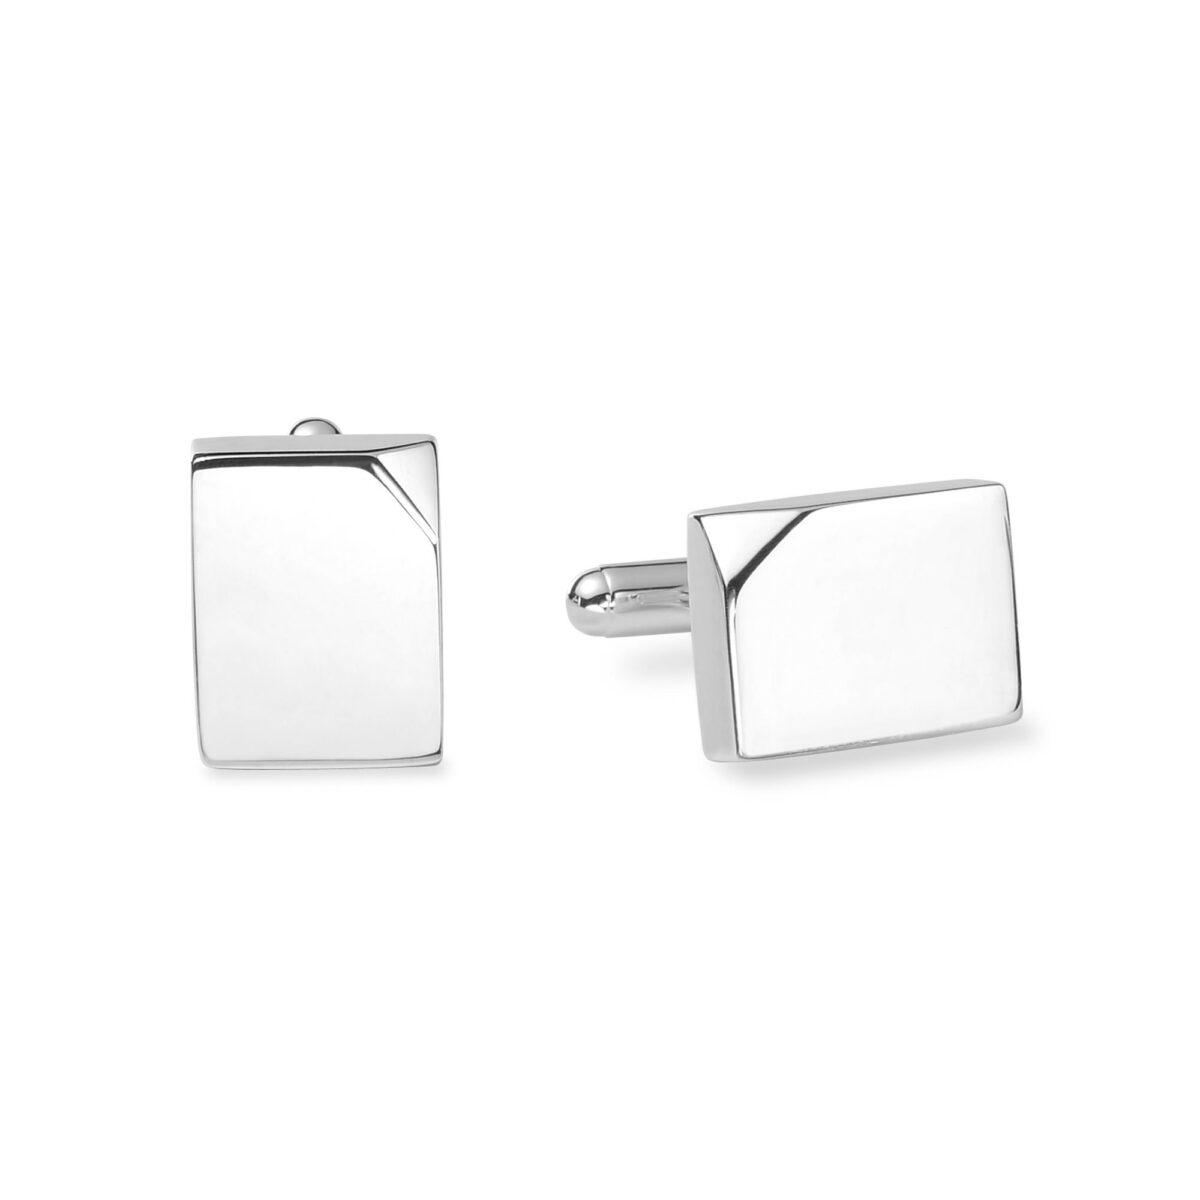 product/c/h/chip-block-cuffs-1.jpg;;product/d/m/dmr-packaging_192.jpg